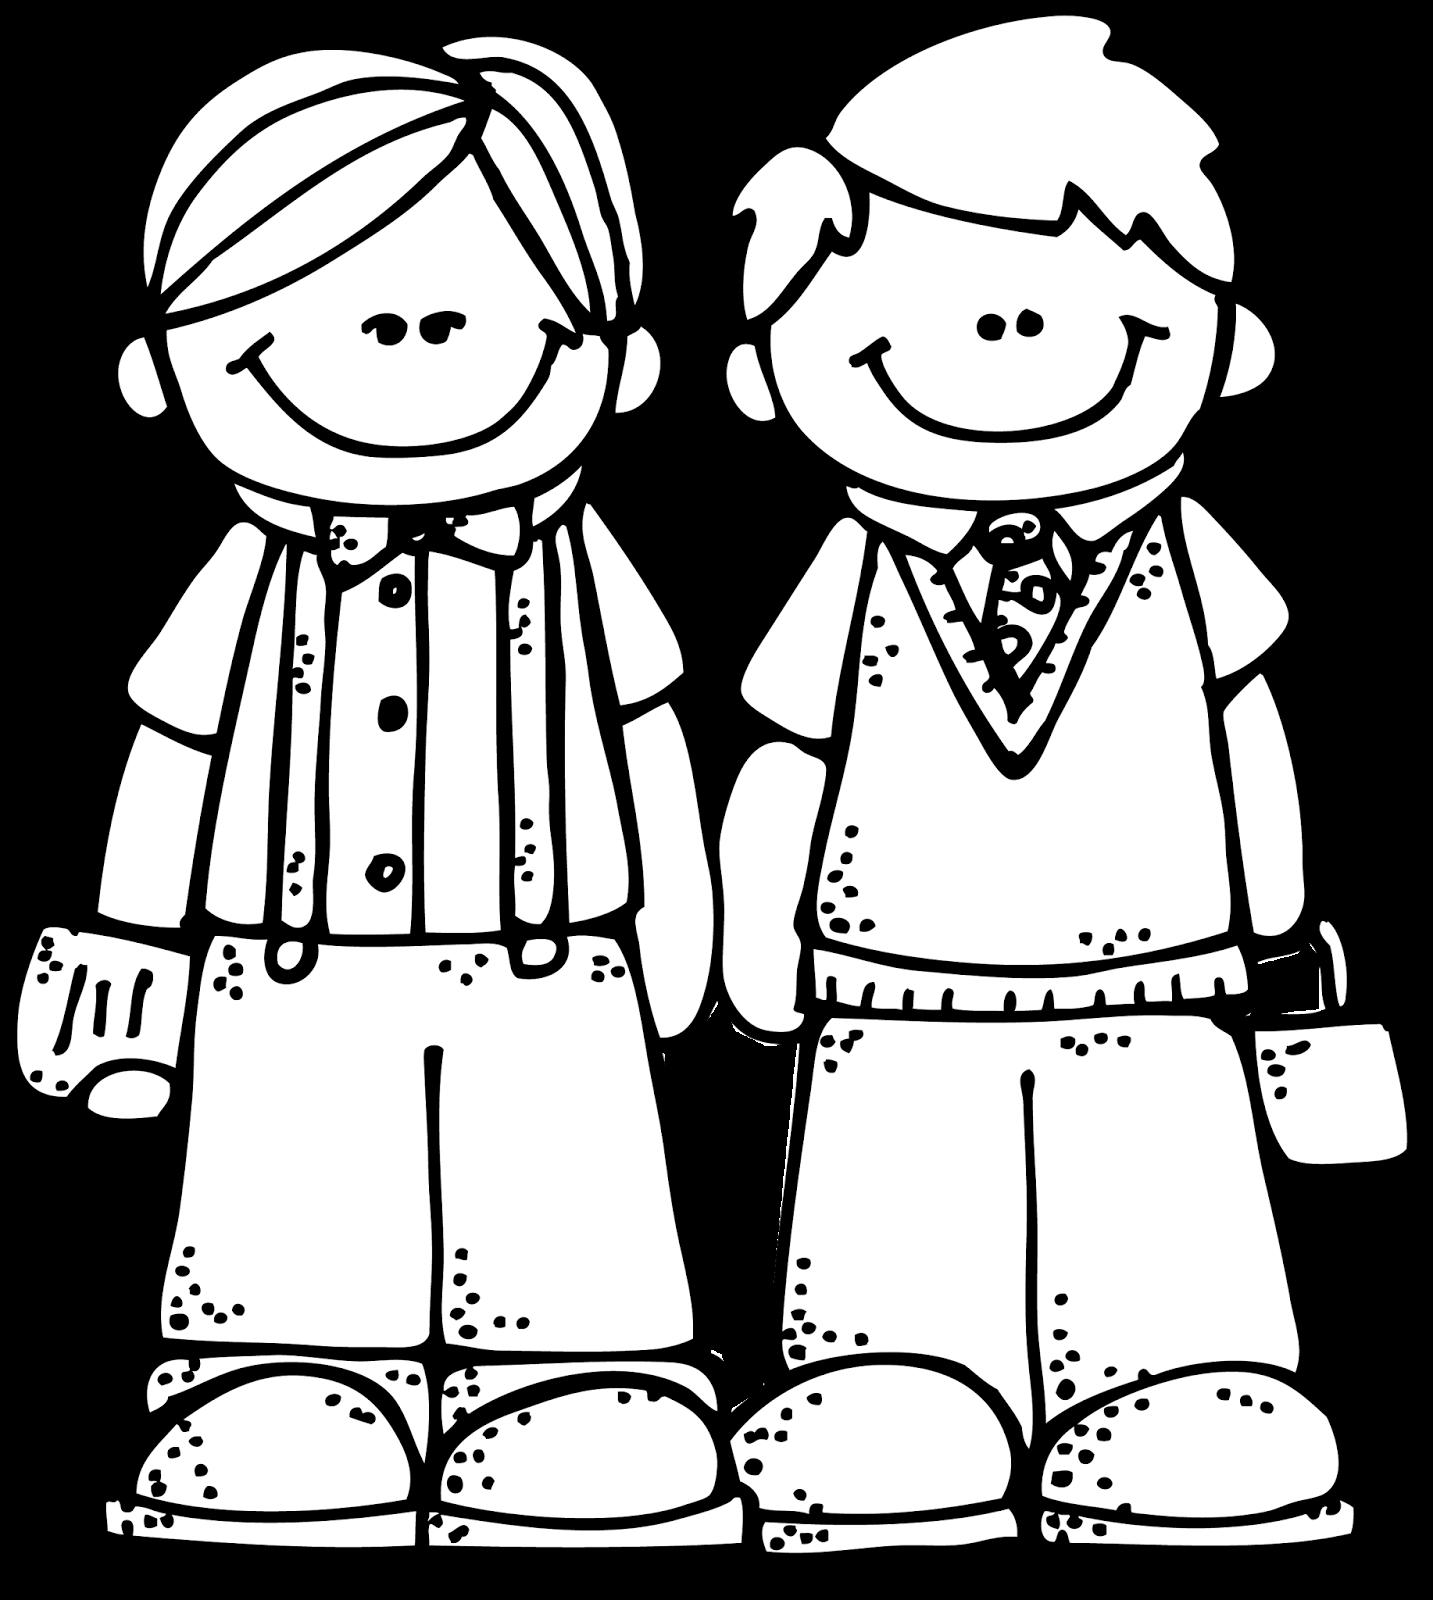 Friends art by melonheadz. Friendship clipart black and white